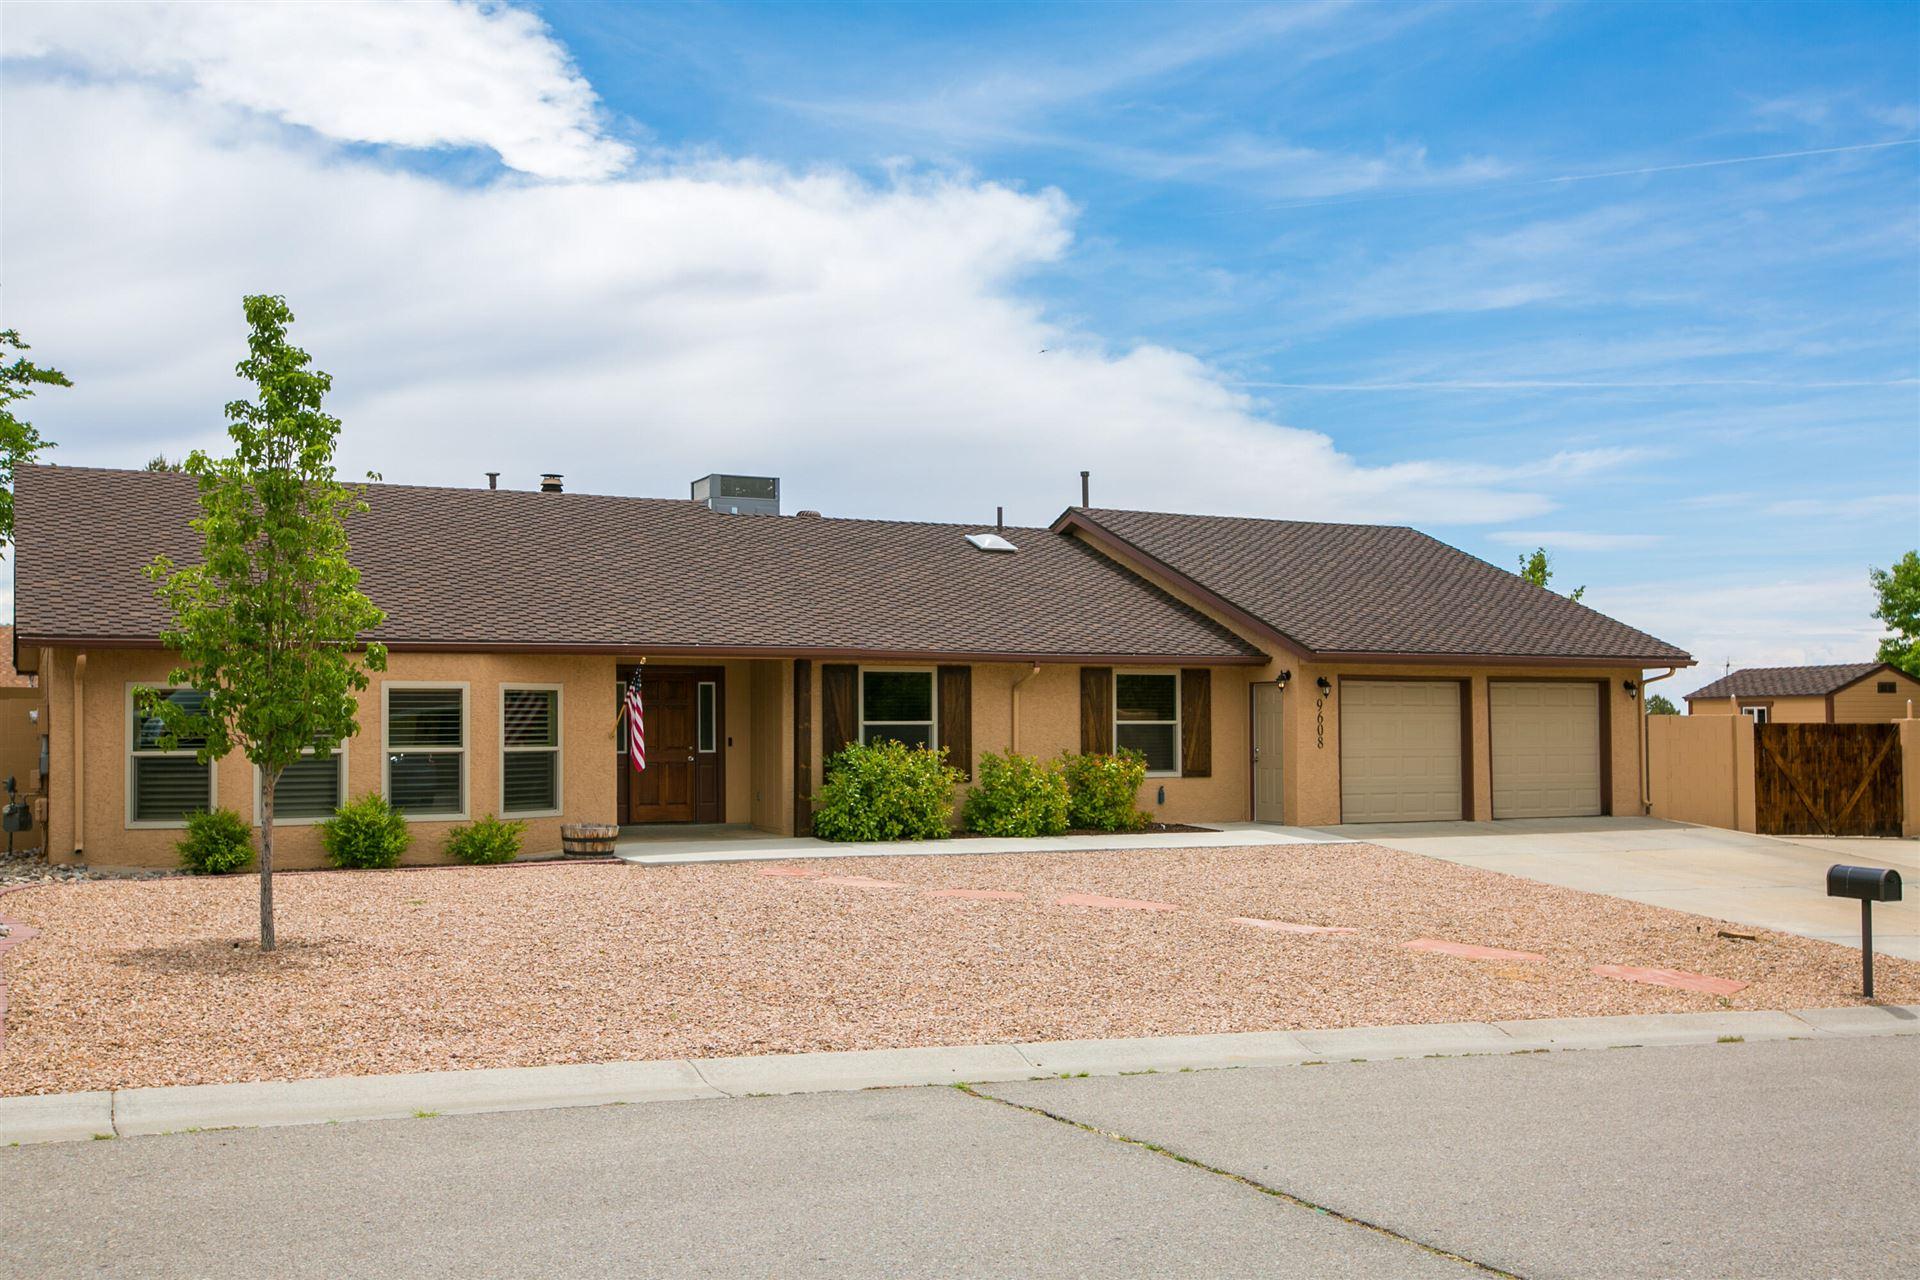 Photo of 9608 VILLA DEL REY NE, Albuquerque, NM 87111 (MLS # 993597)